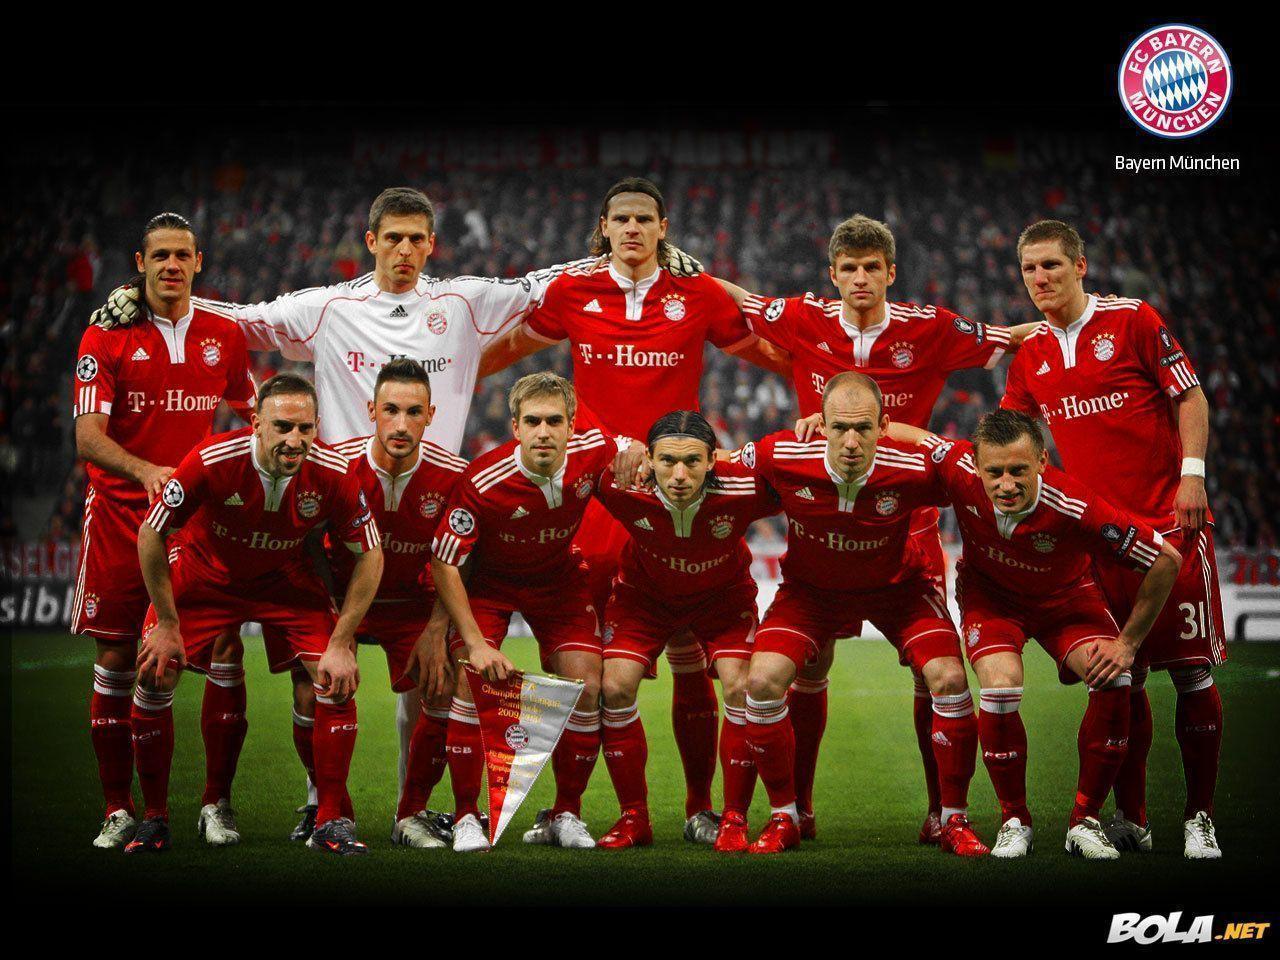 Fc Bayern Munich Cool Wallpapers 24920 Images   wallgraf.